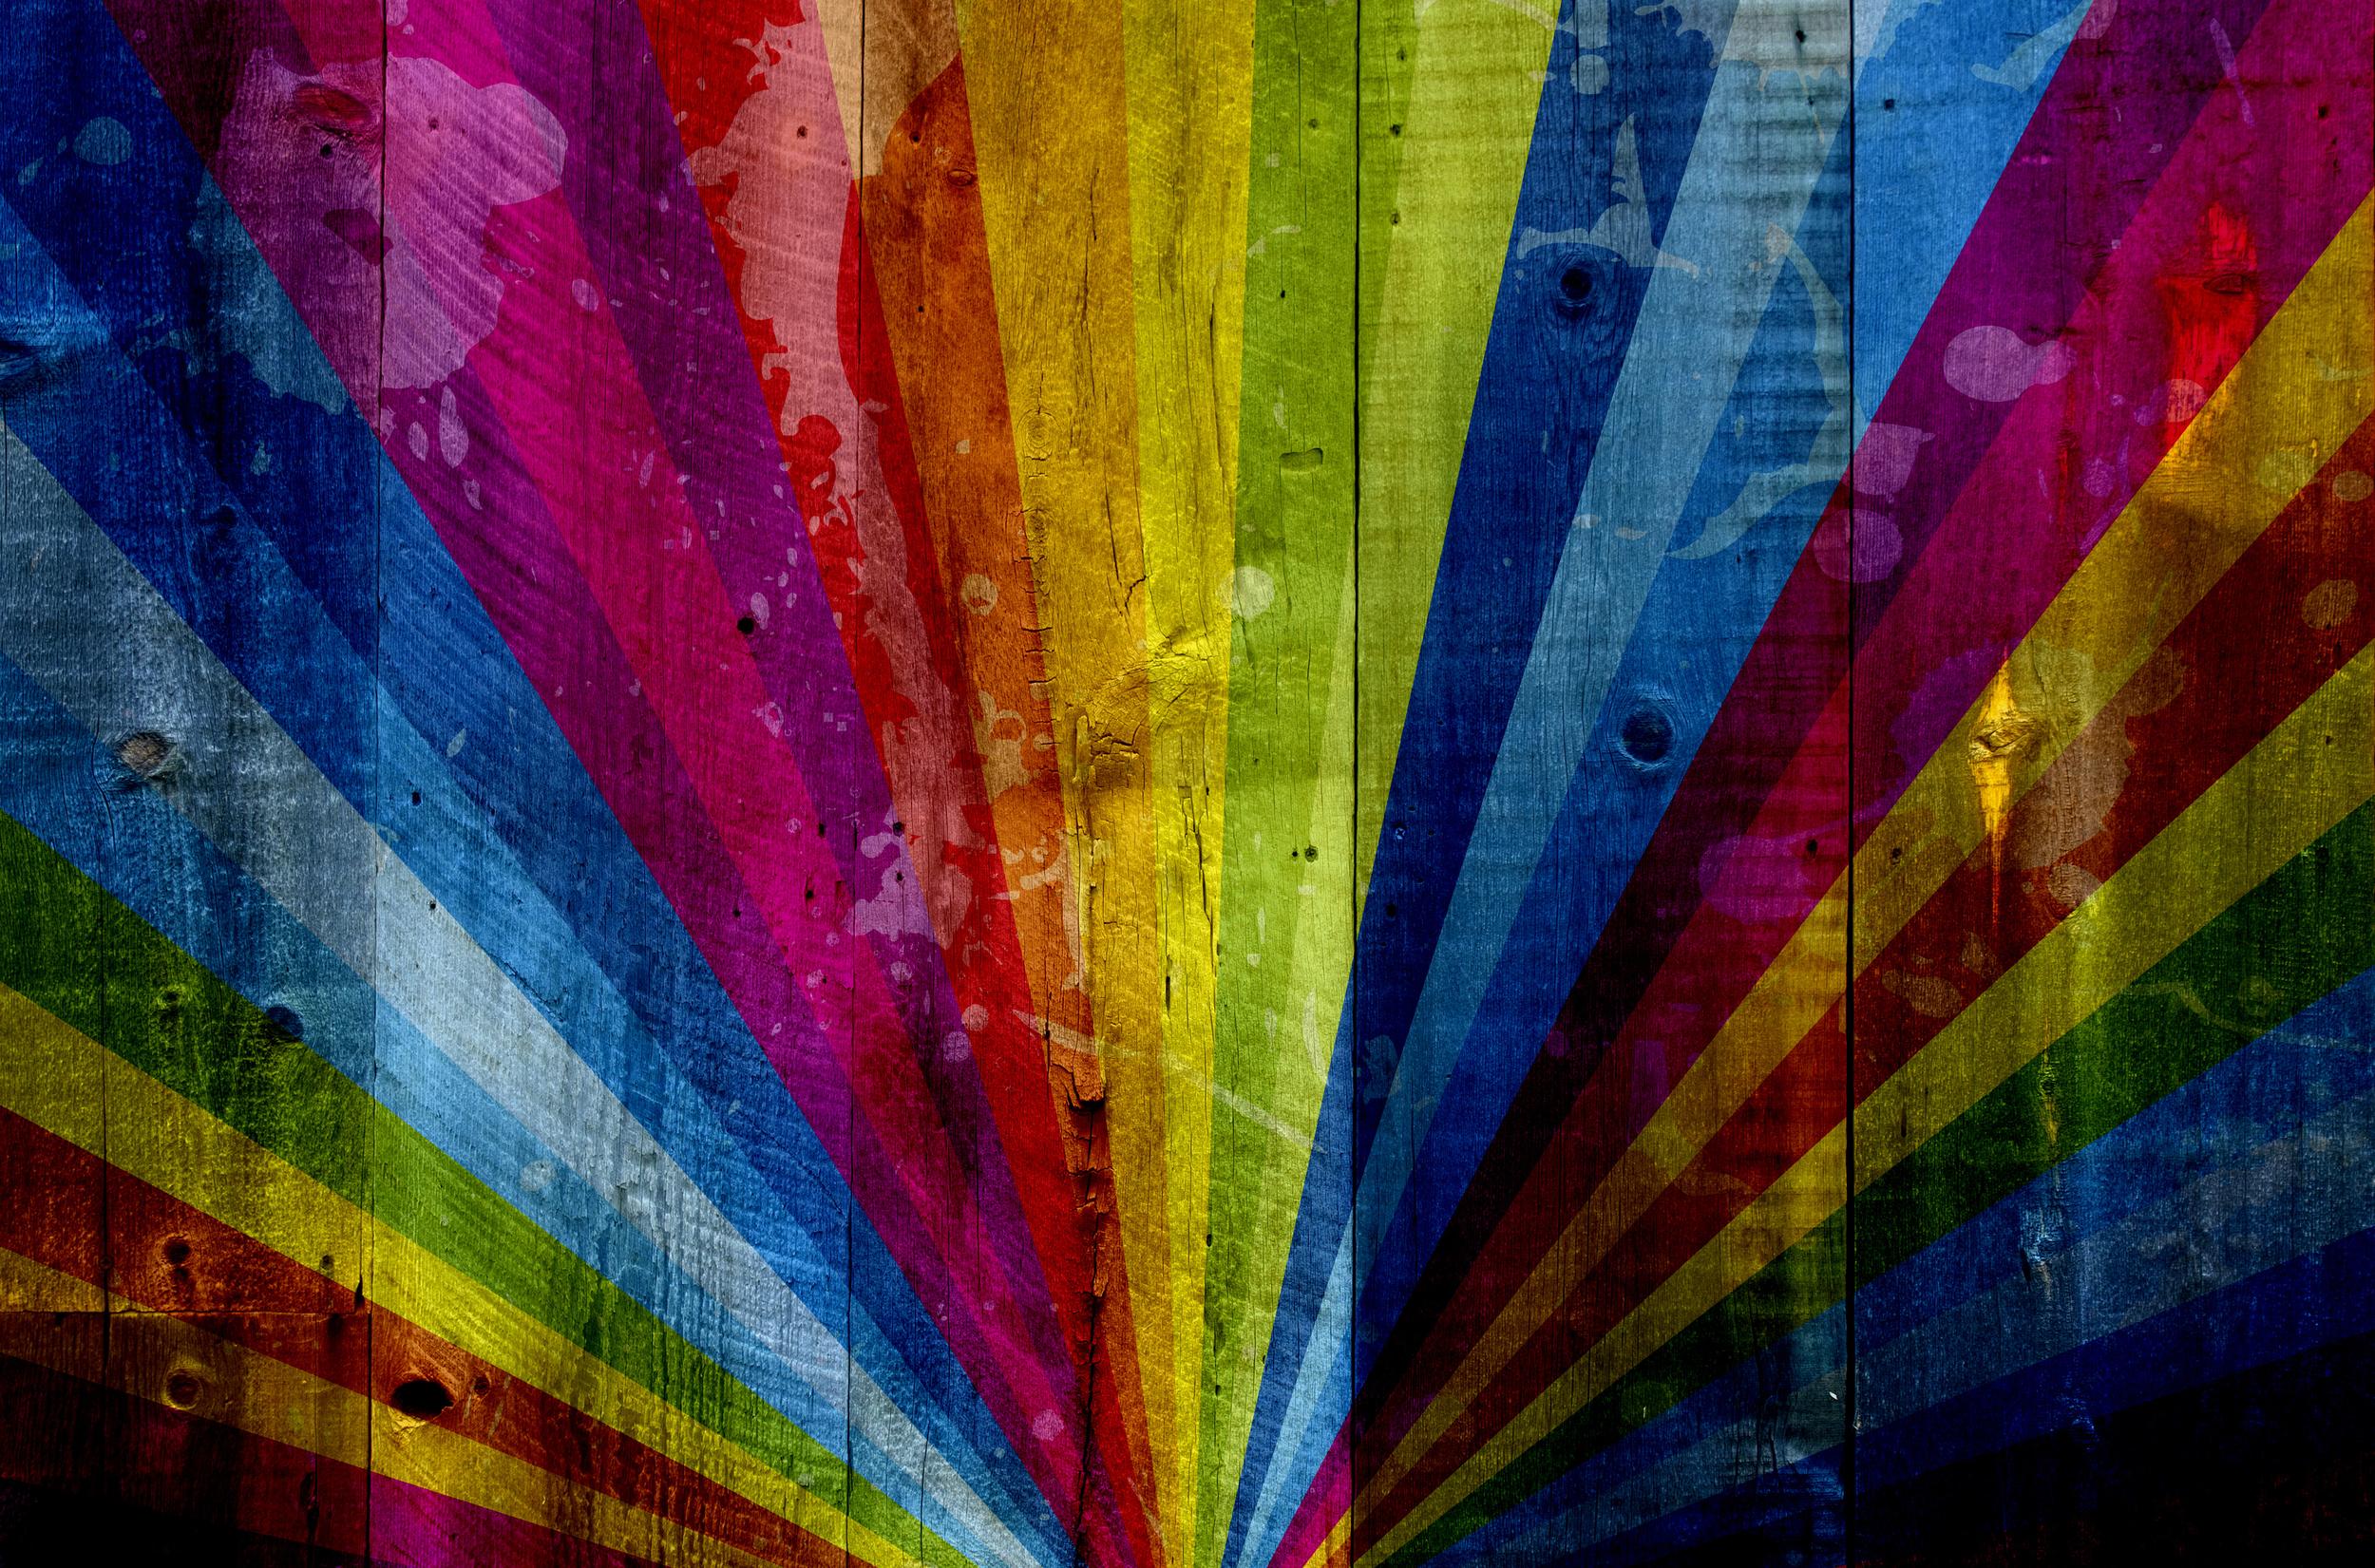 rainbow-grunge-wood-sunburst_G1A3wkYd.jpg